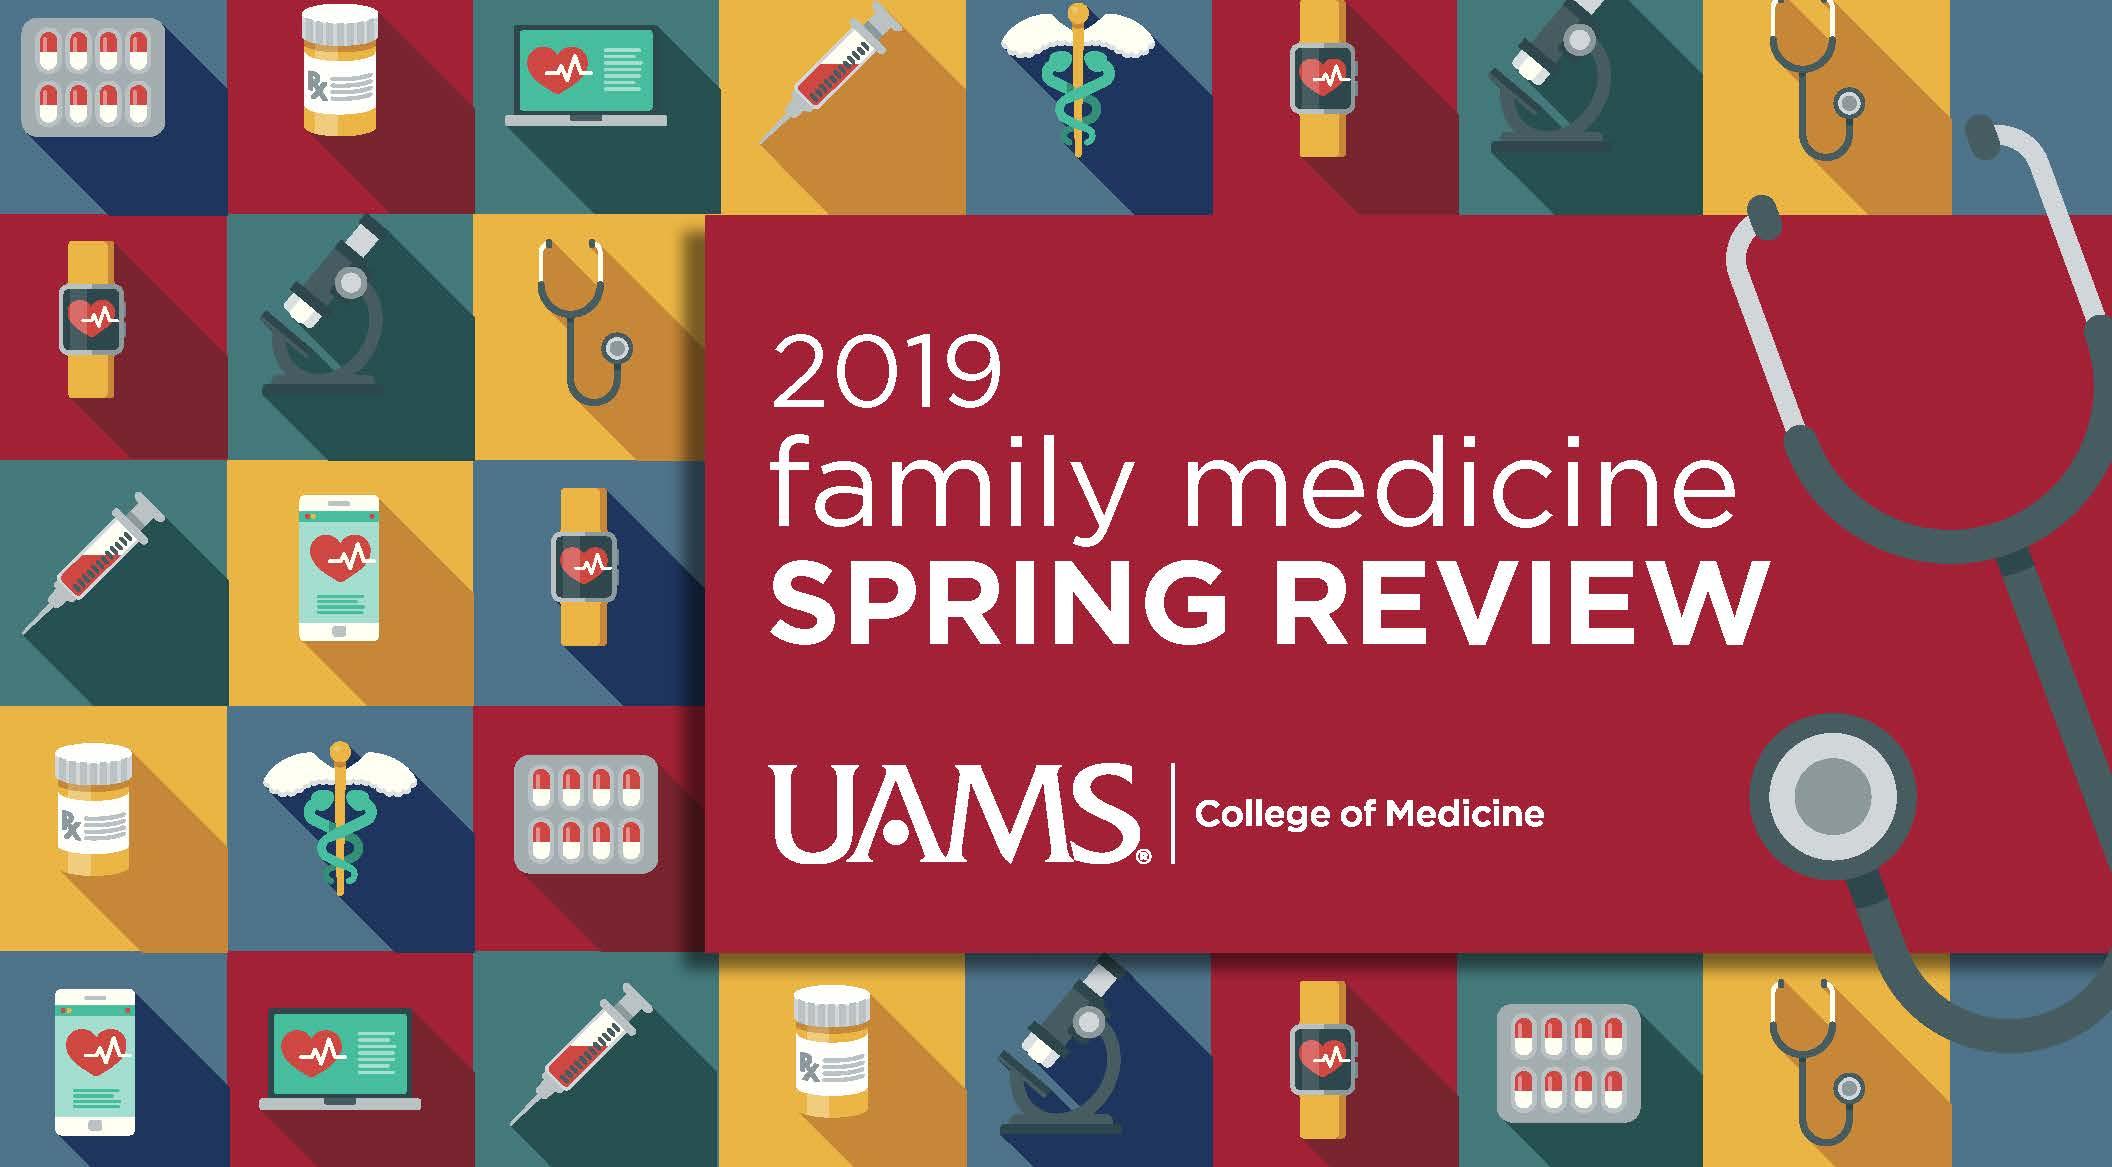 2019 Family Medicine Spring Review